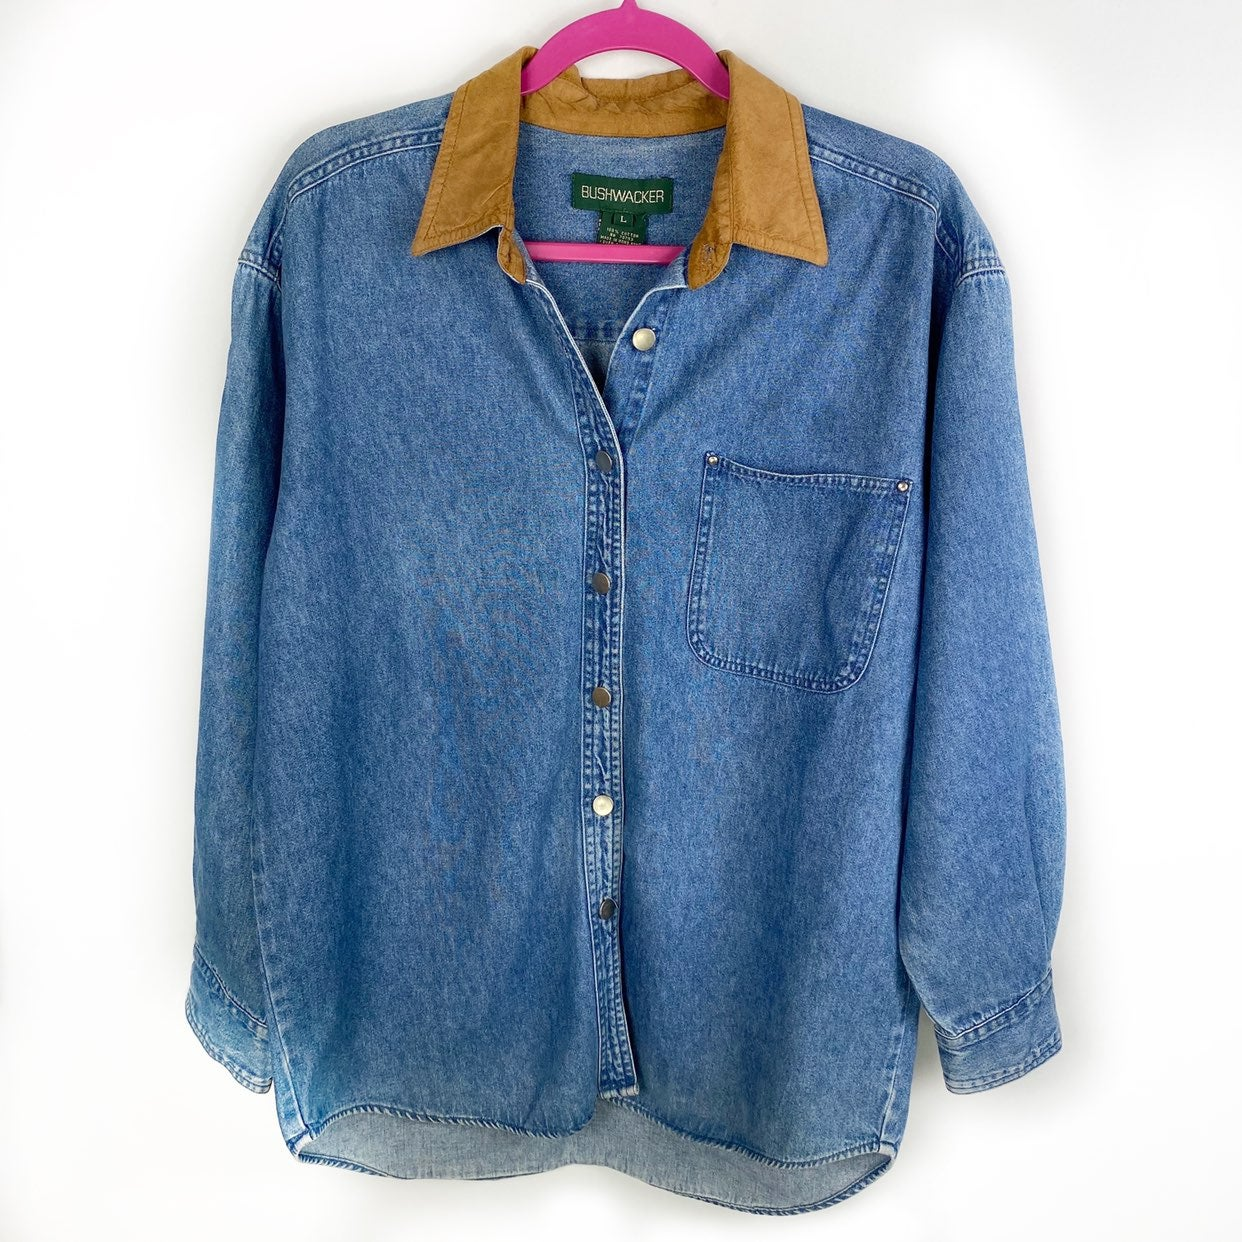 Bushwacker Vintage Oversized Denim Shirt